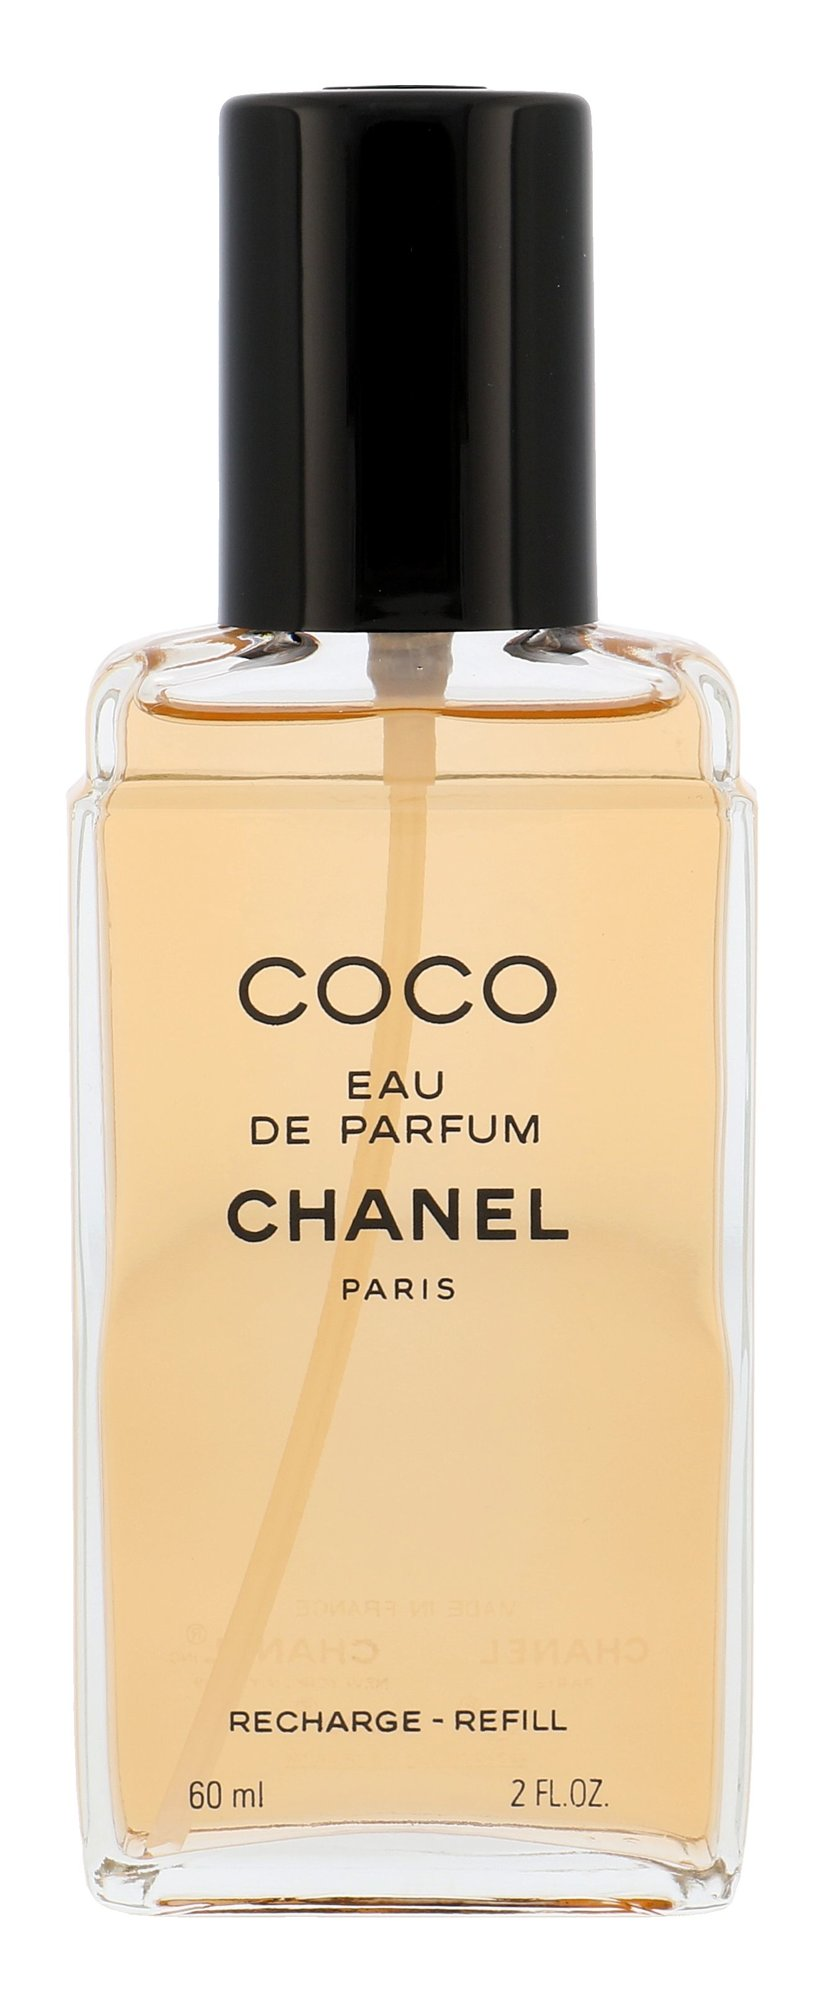 Chanel Coco Eau de Parfum 60ml